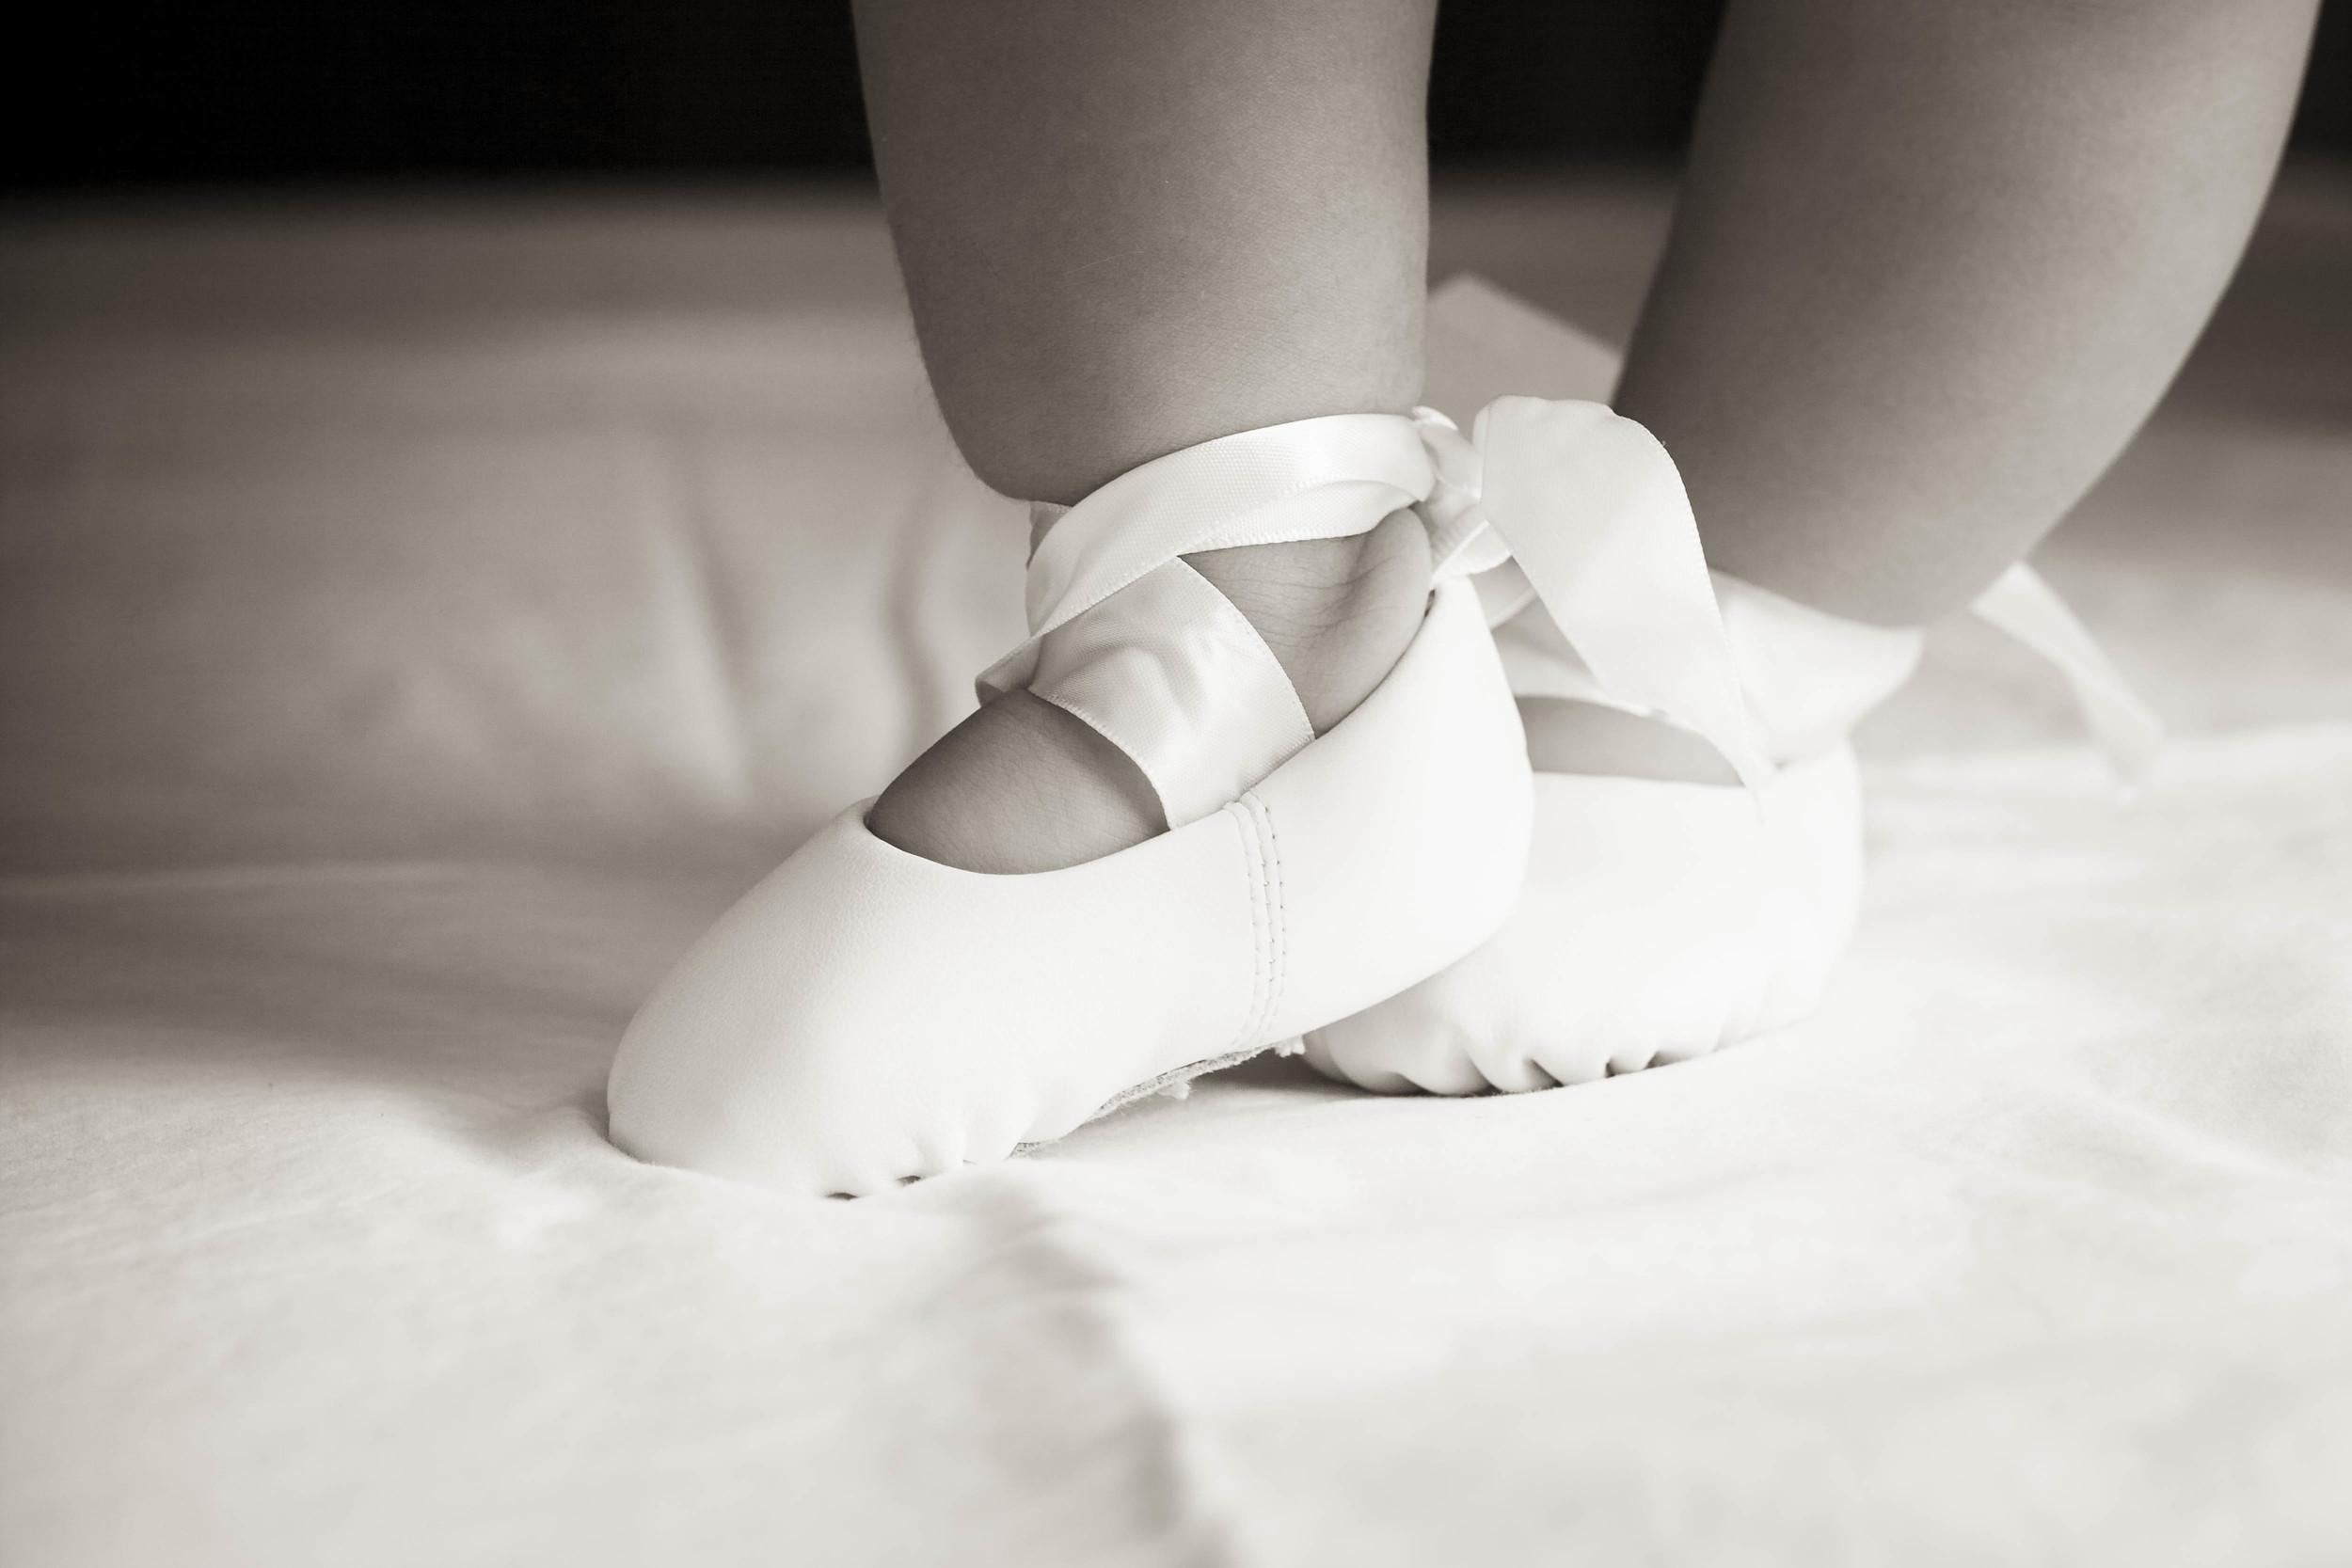 baby slippers-8591.jpg